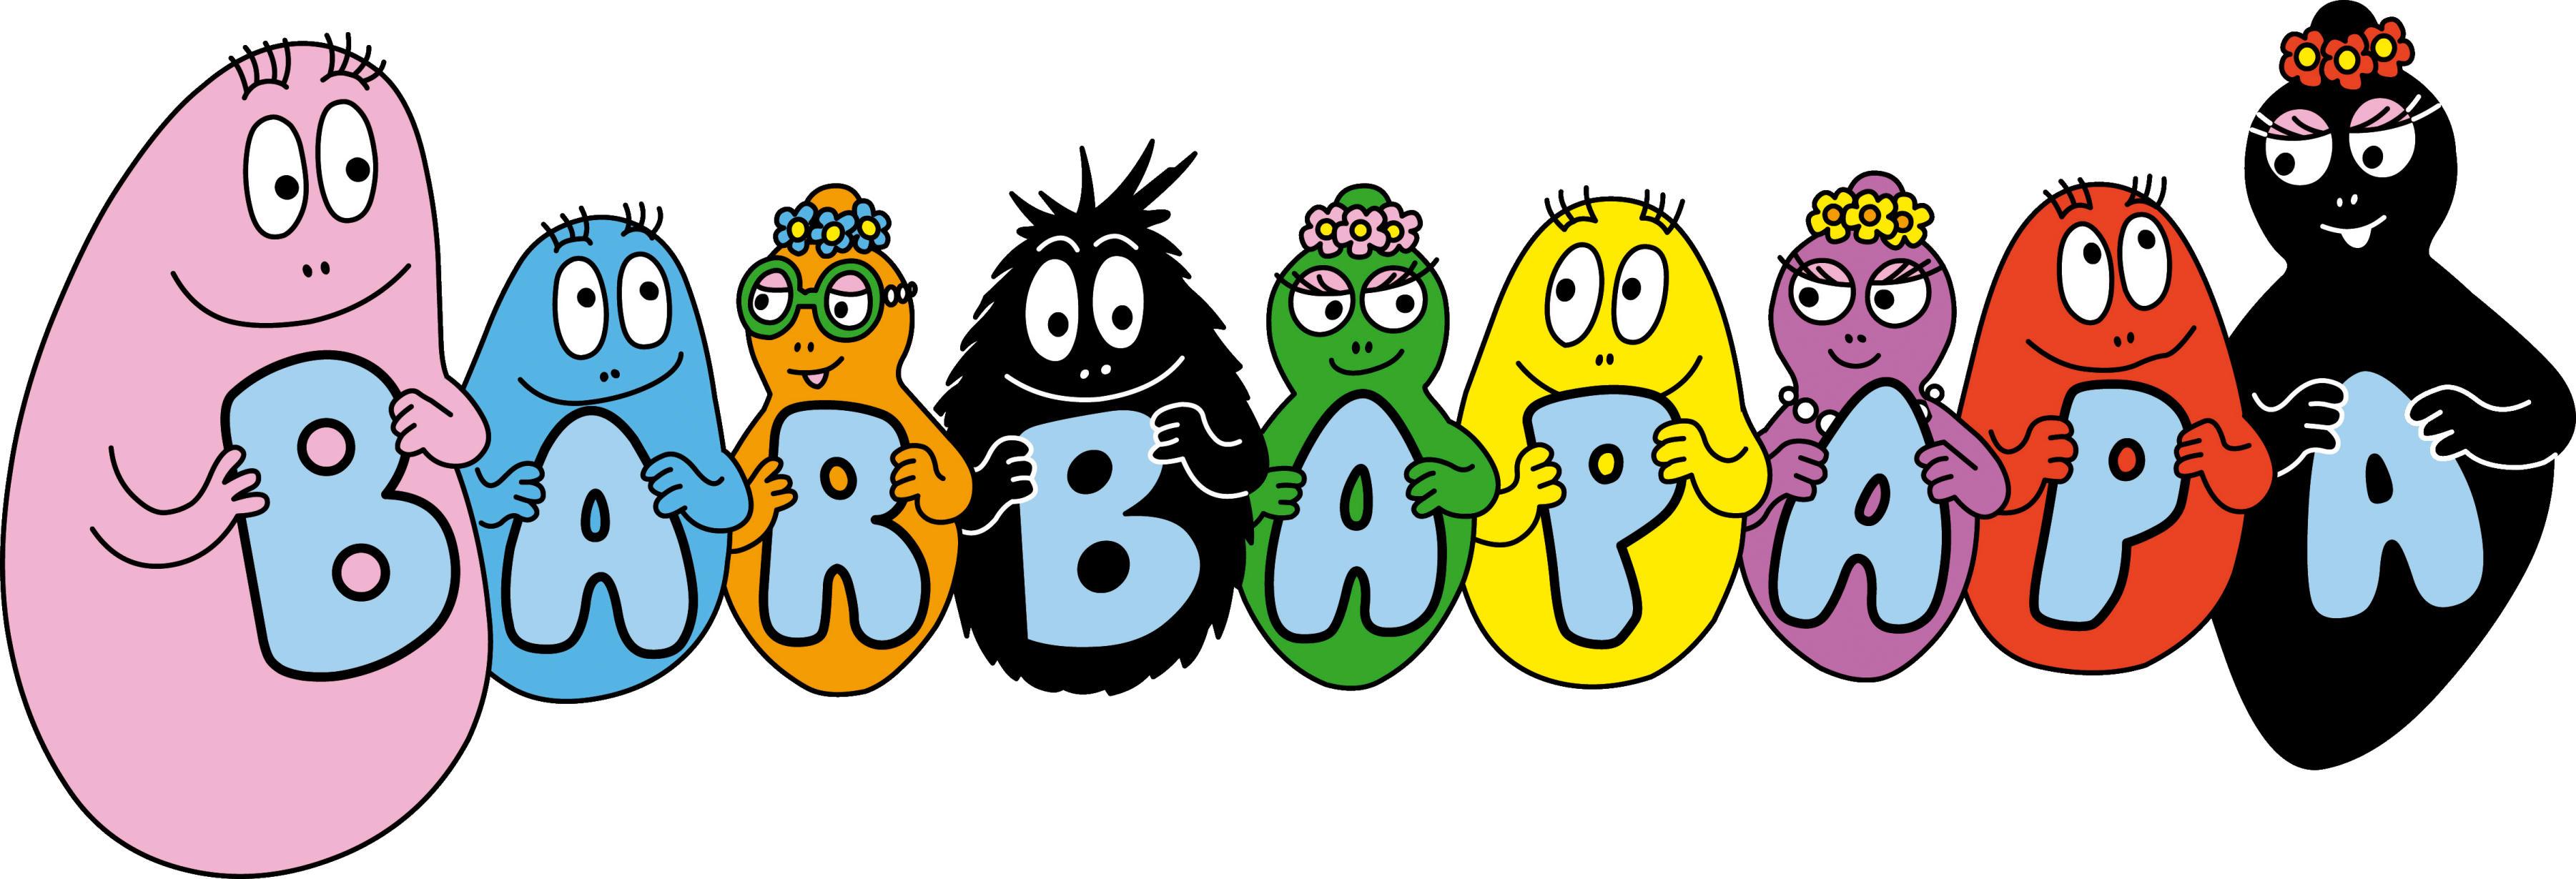 images barbapapa